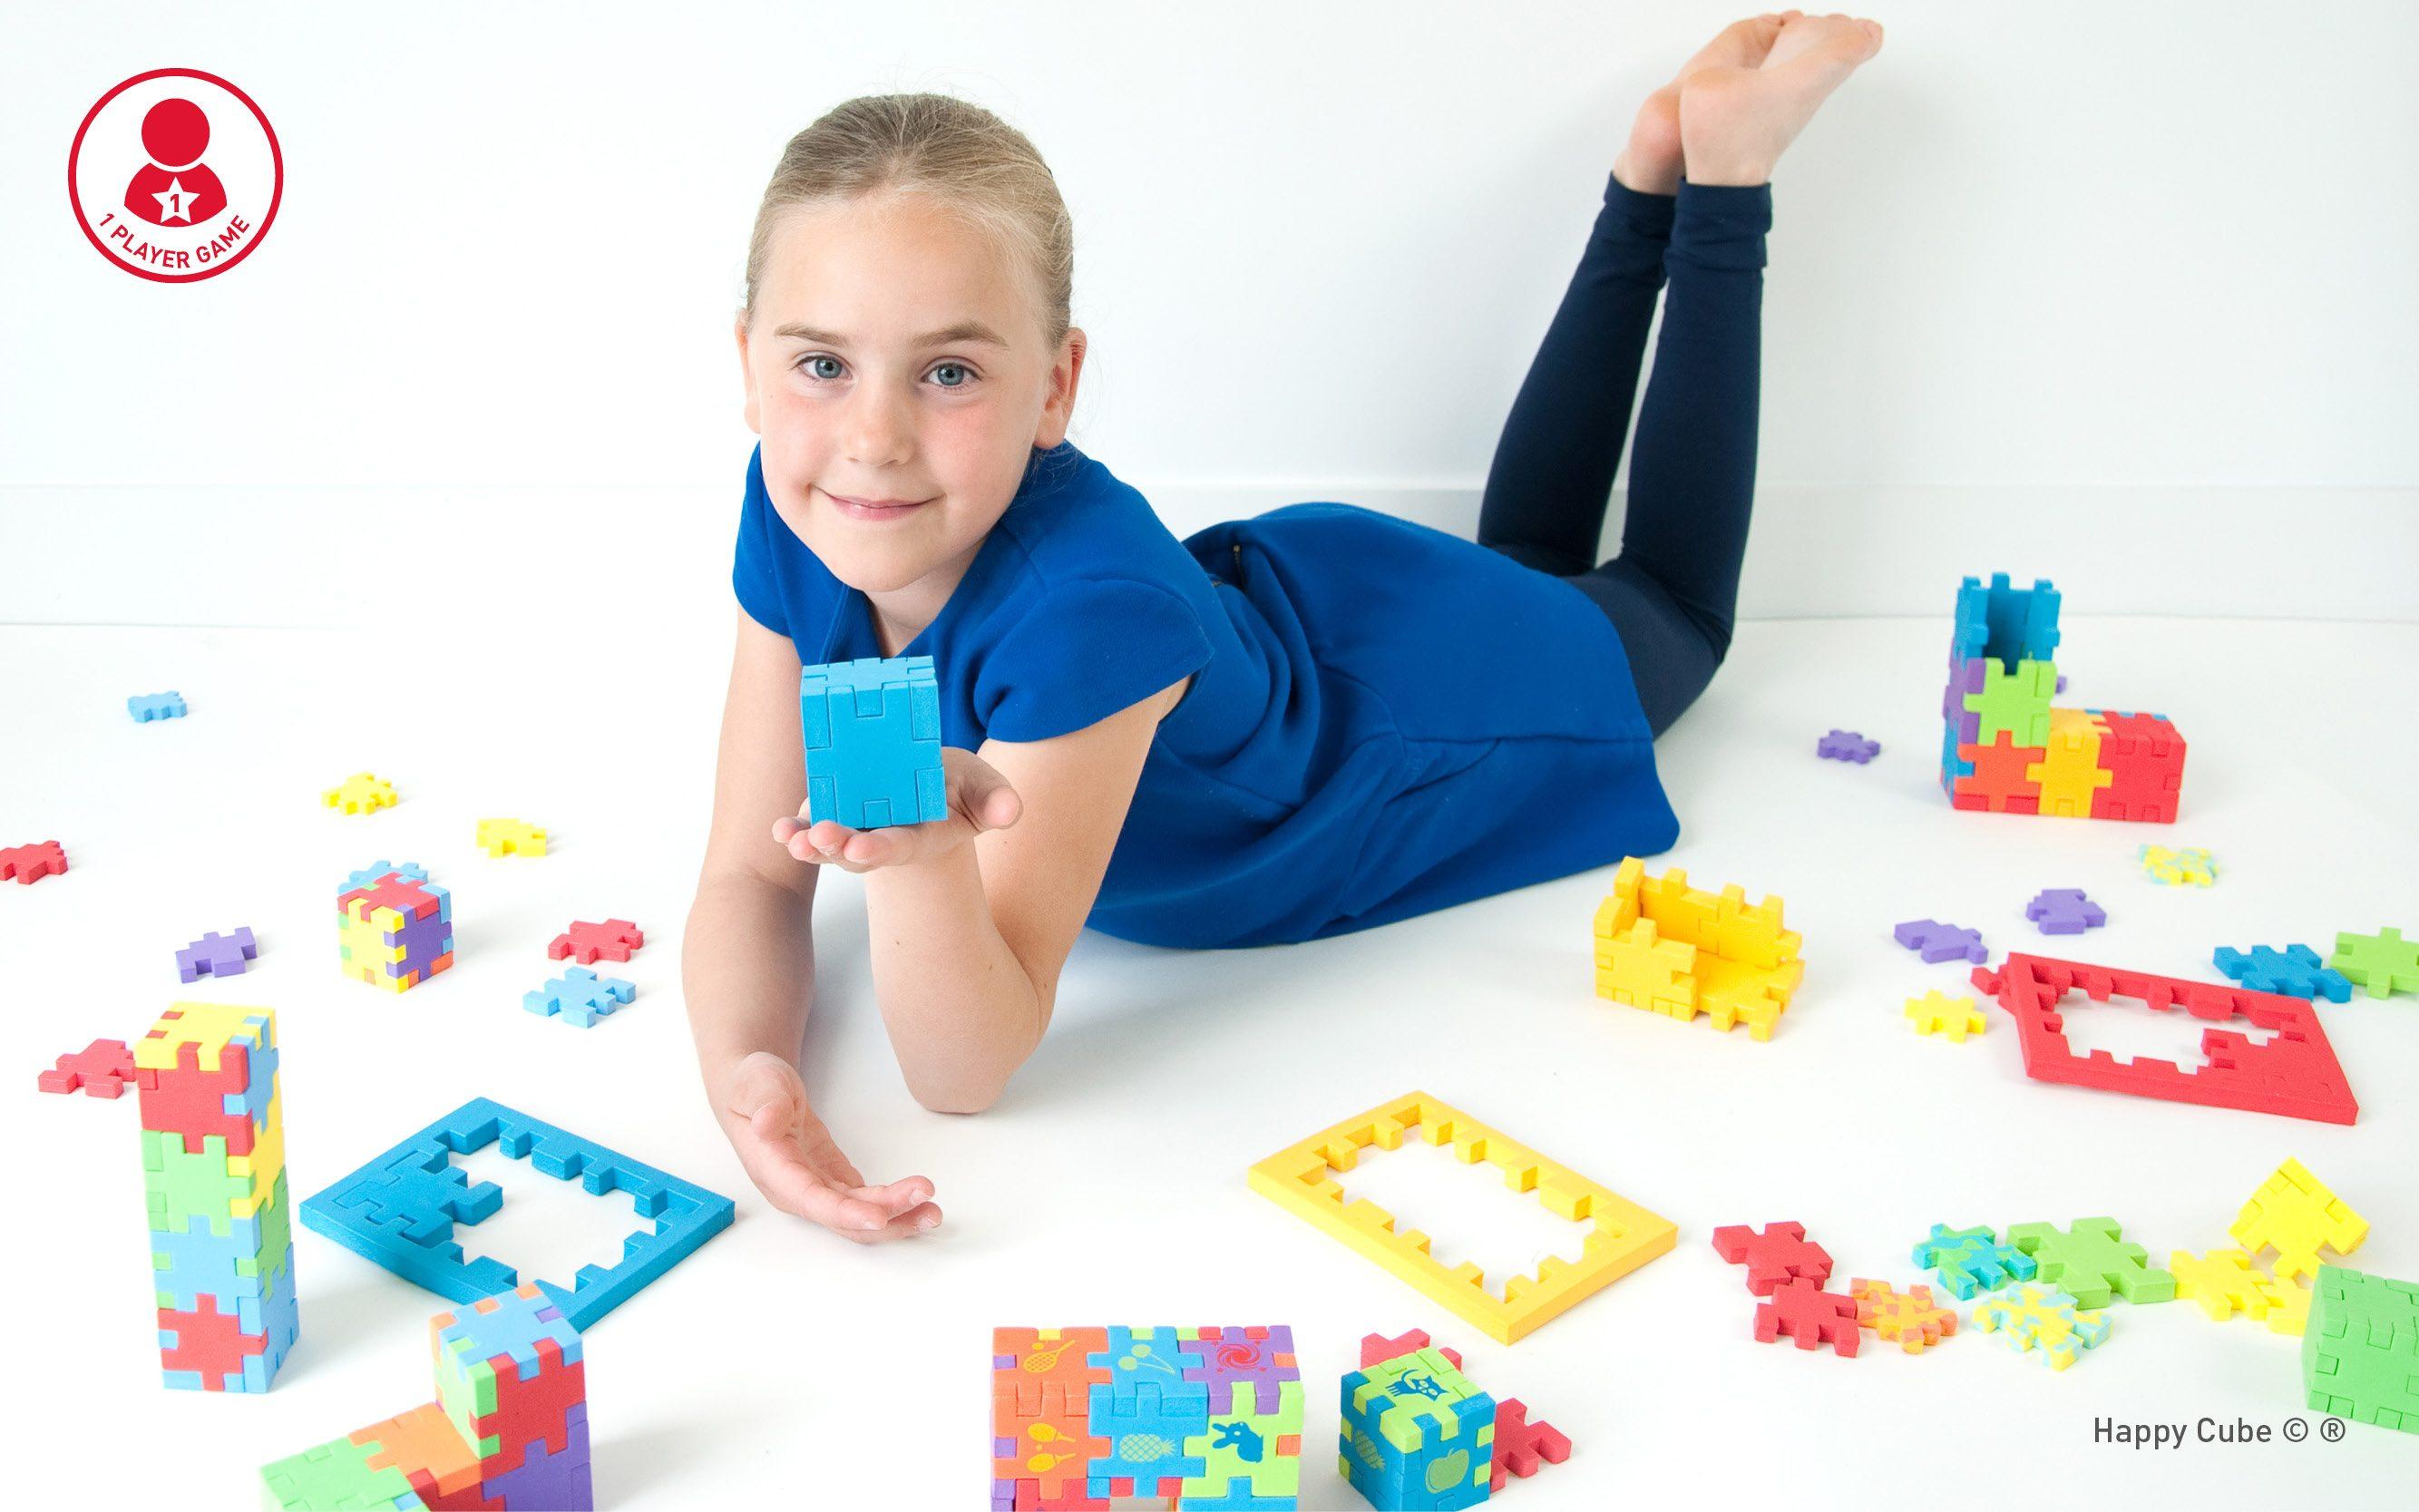 Happy_HappyCube_foam-cube-puzzles-3D-educational-games